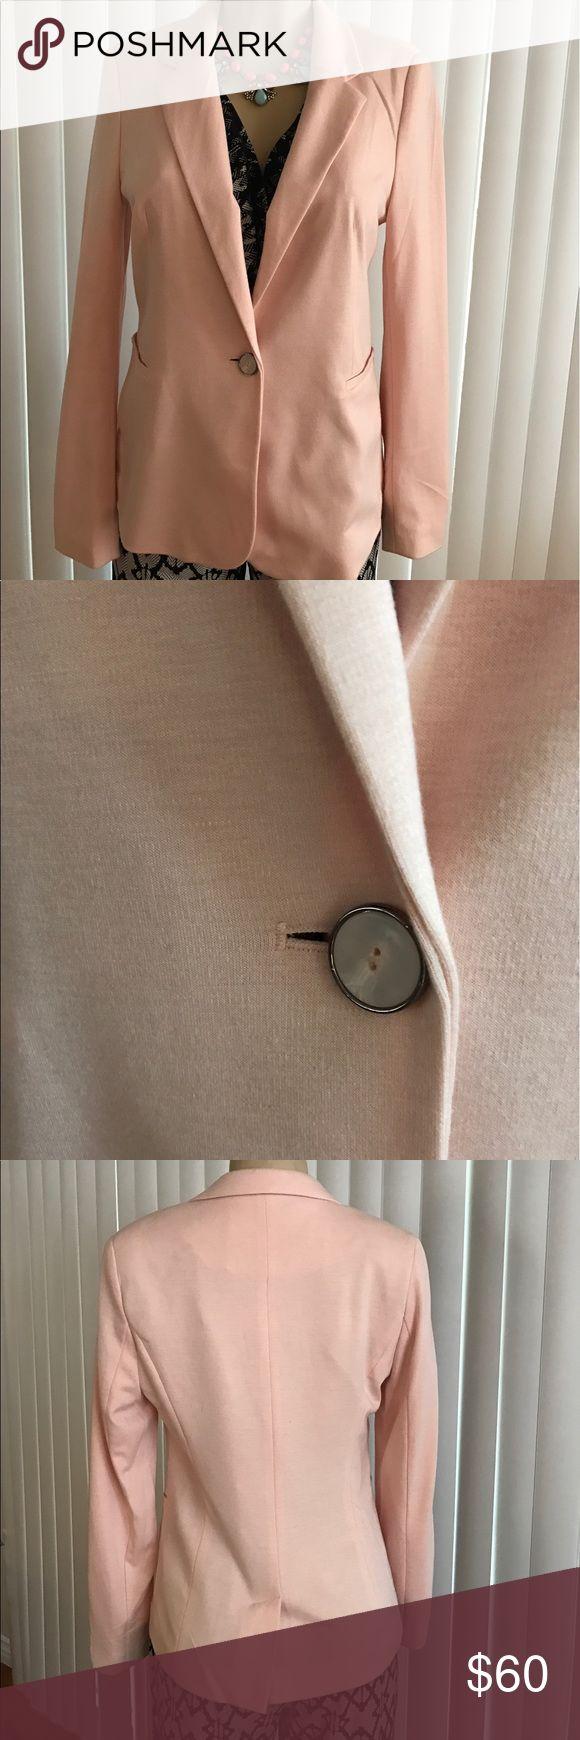 BCBGENERATION blazer - Size S Blush BCBGENERATION blazer - size Small.  ✨FINAL PRICE REDUCTION✨.  PRICE IS FIRM BCBGeneration Jackets & Coats Blazers